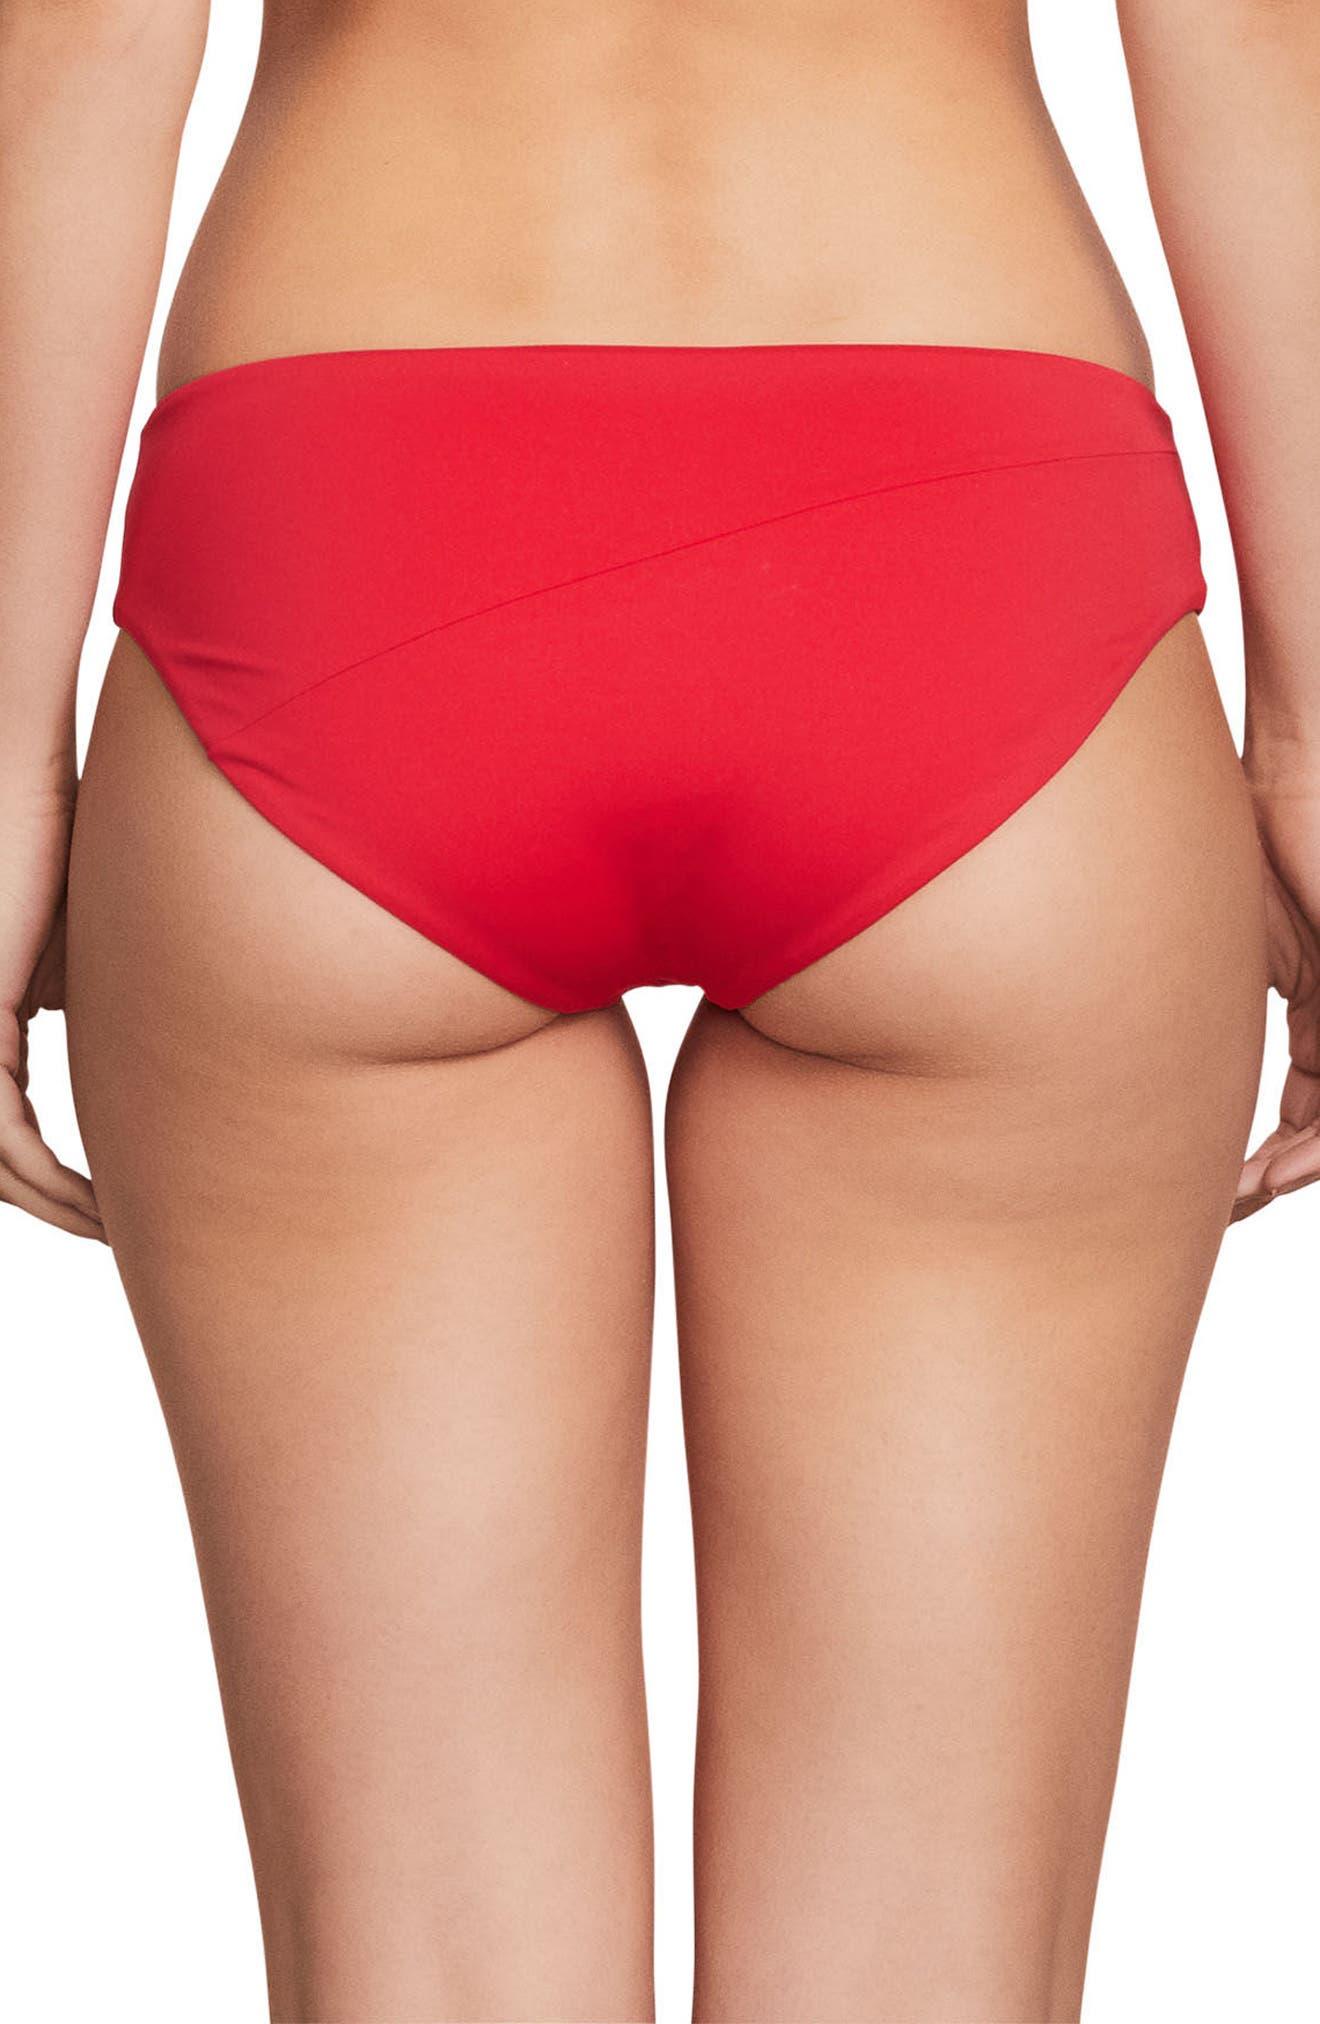 Simply Modest Bikini Bottoms,                             Alternate thumbnail 2, color,                             True Red